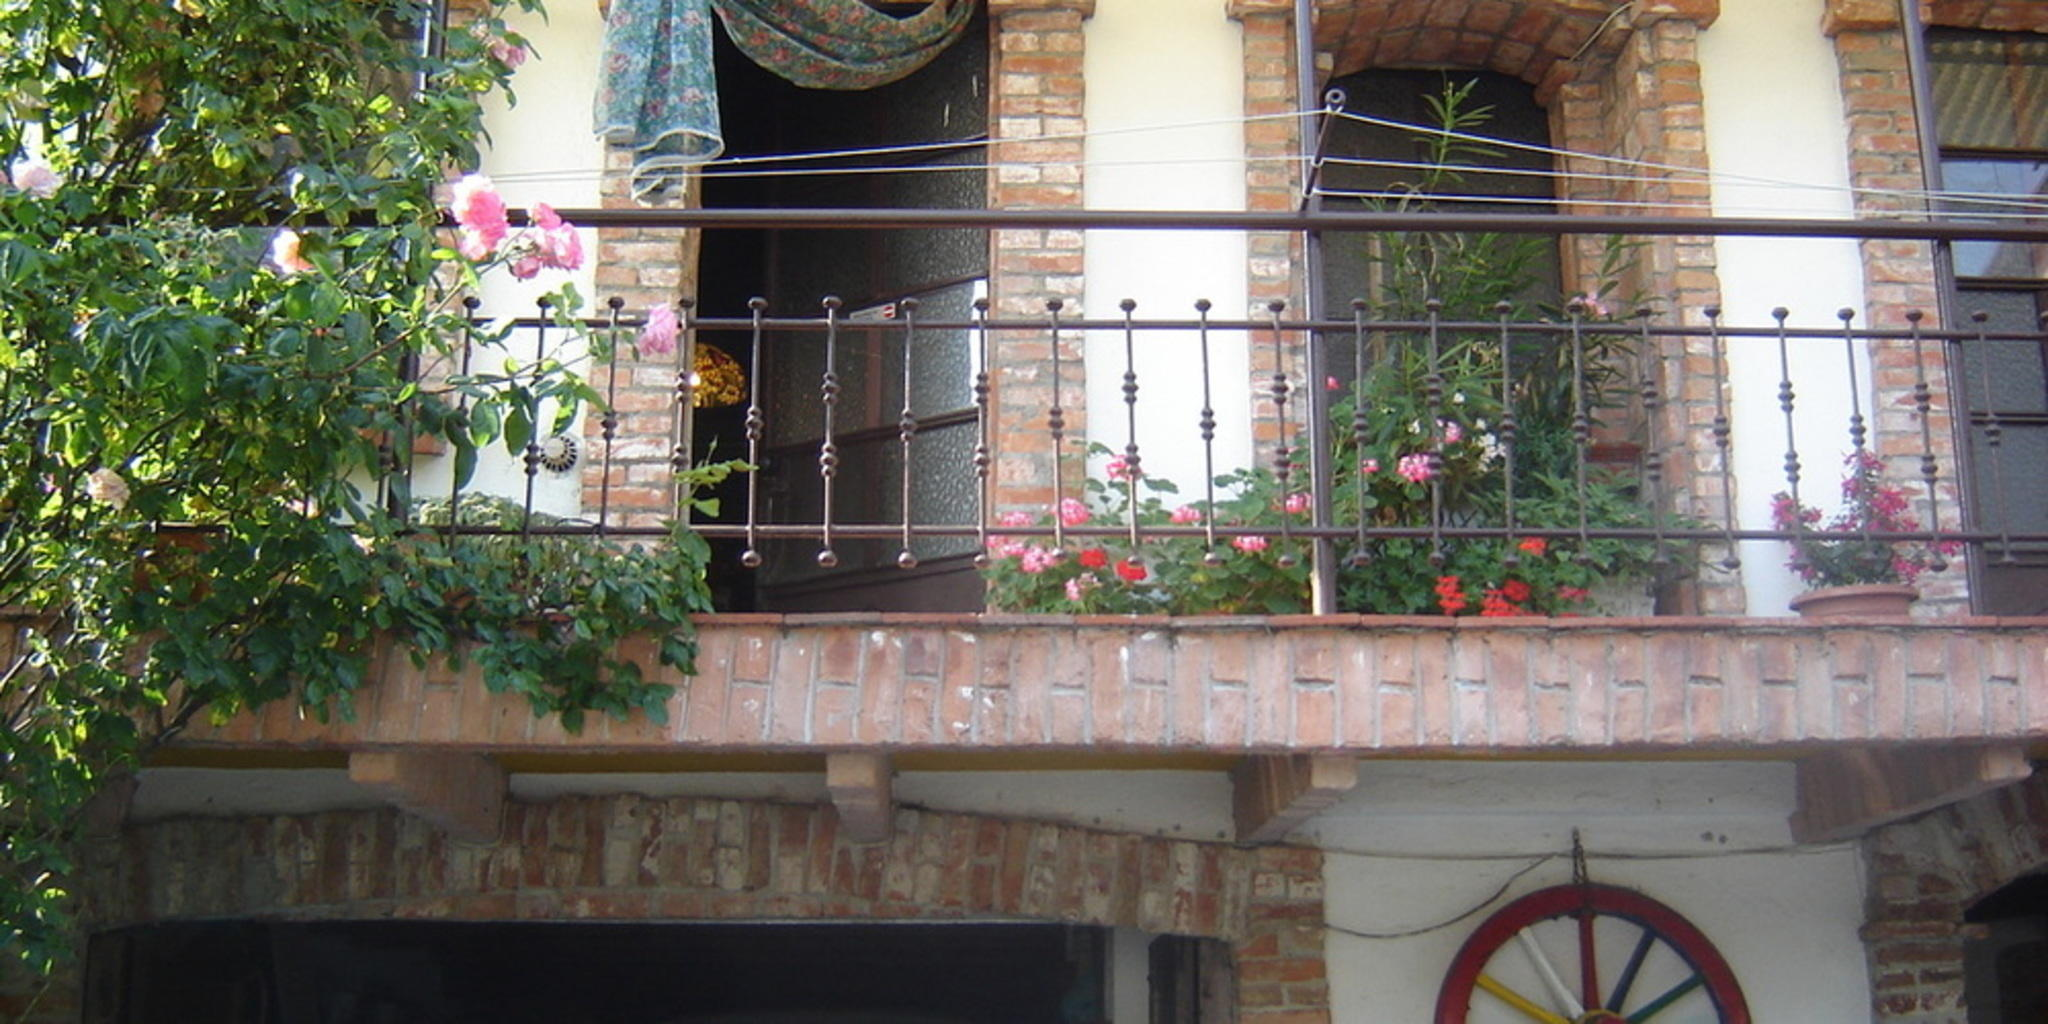 Bed breakfast cuneo belvedere langhe for Piani casa com classico cane trotto stile